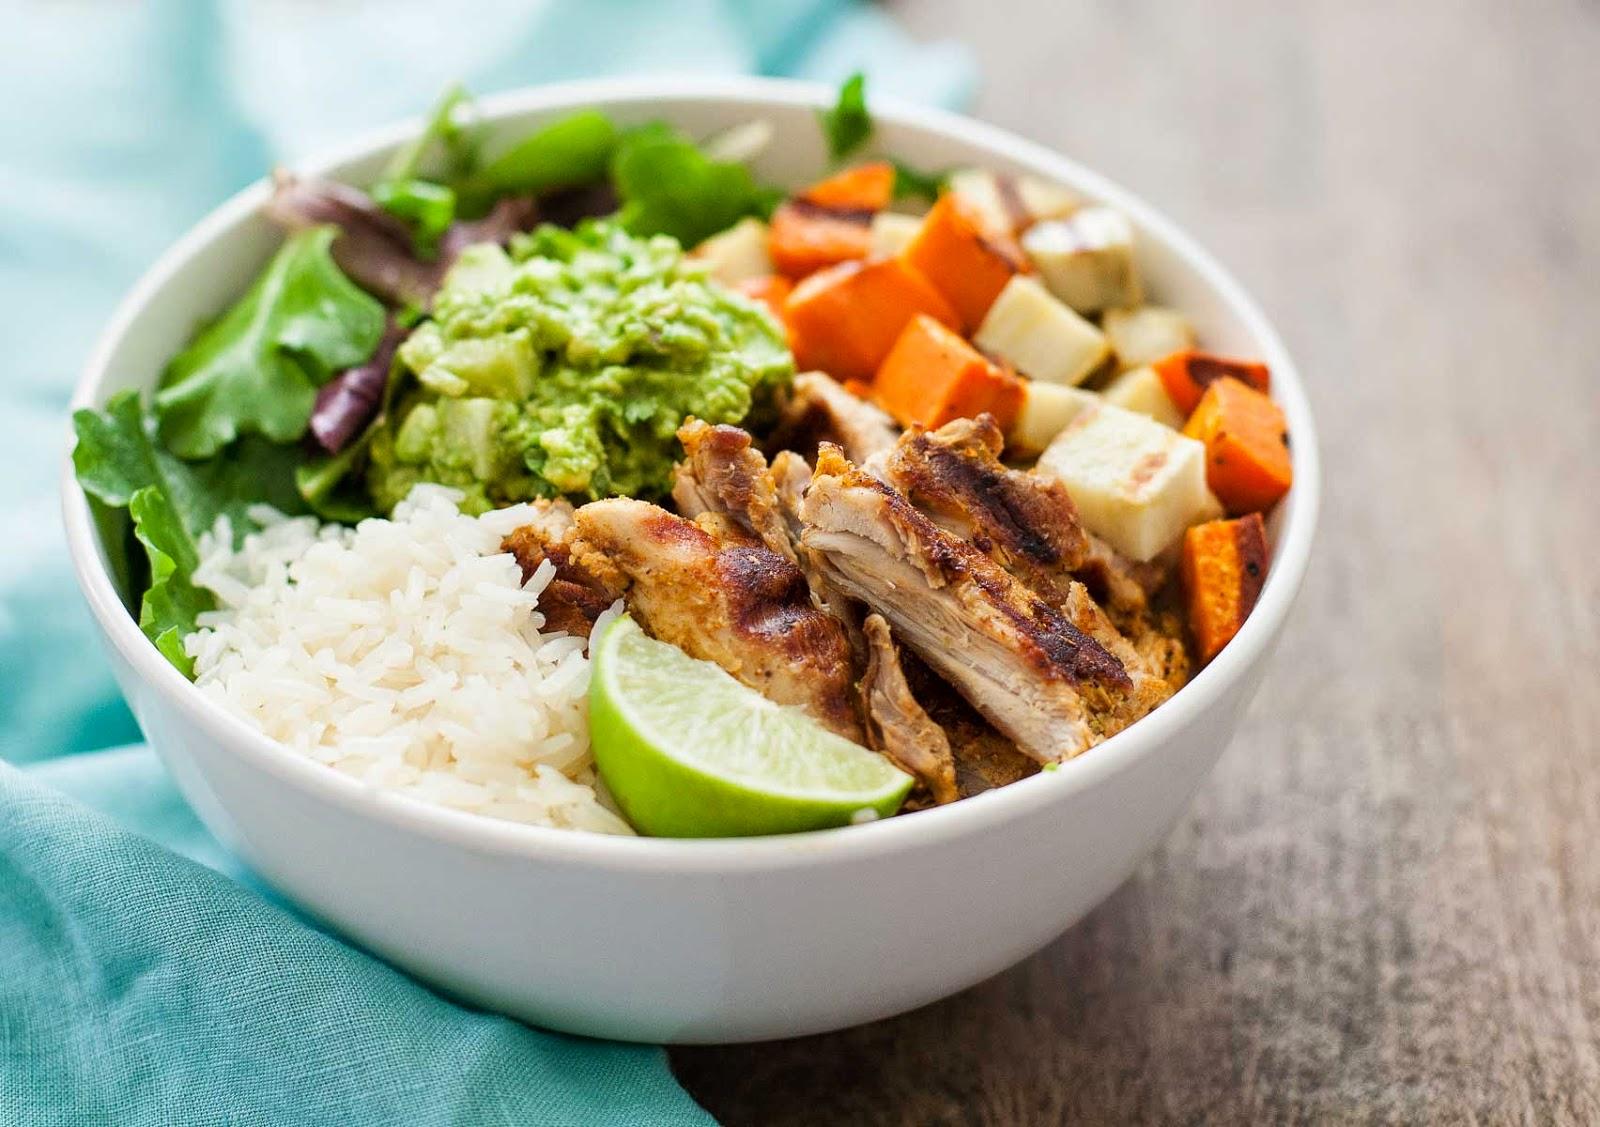 Grilled Adobo Chicken Sweet Potato Bowls With Jicama Guacamole